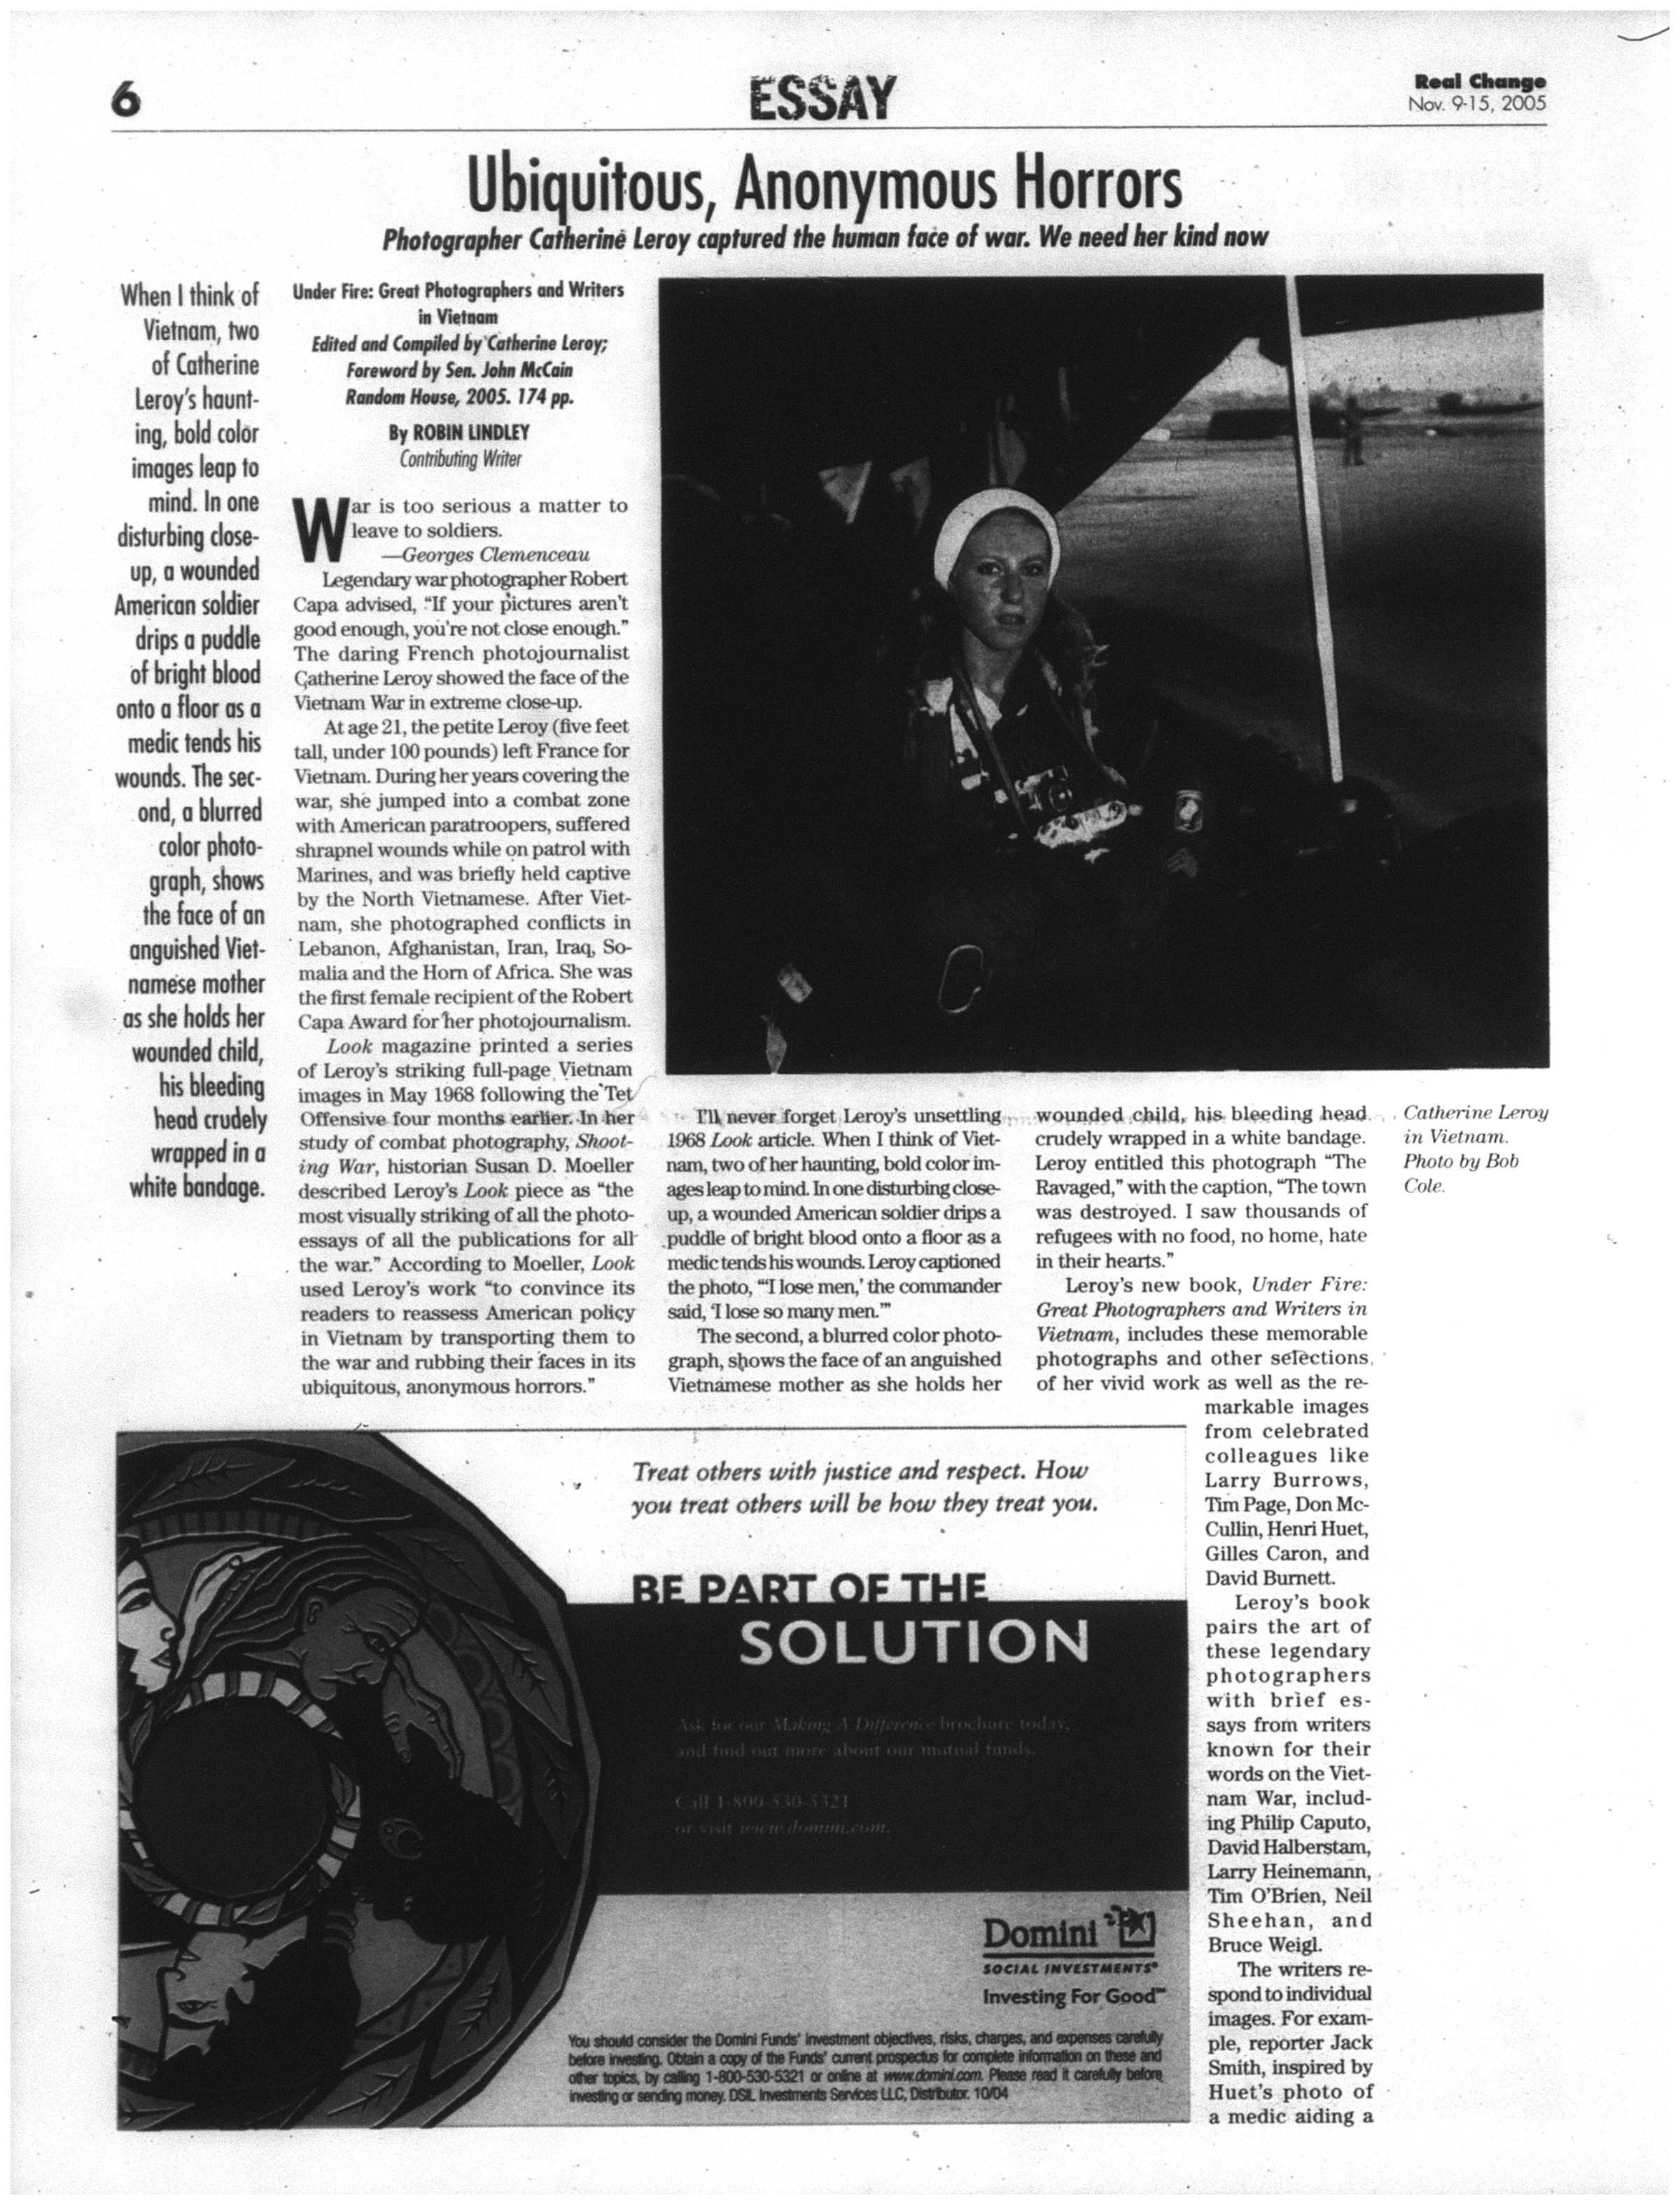 Ubiquitous, Anonymous Horrors  | November 9, 2005 | Real Change